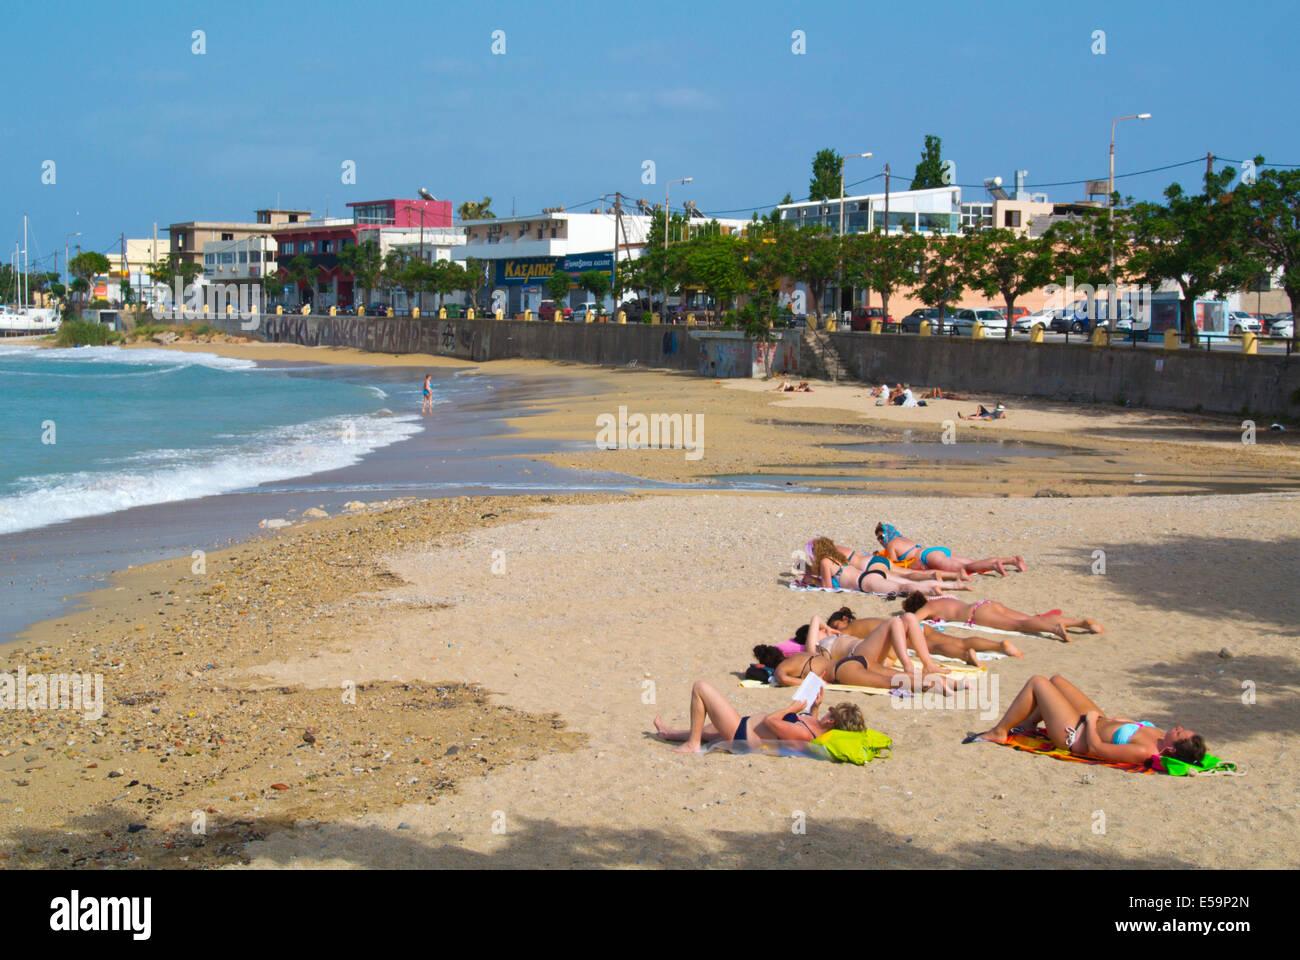 Akandia beach, Rhodes town, Rhodes island, Dodecanese islands, Greece, Europe - Stock Image